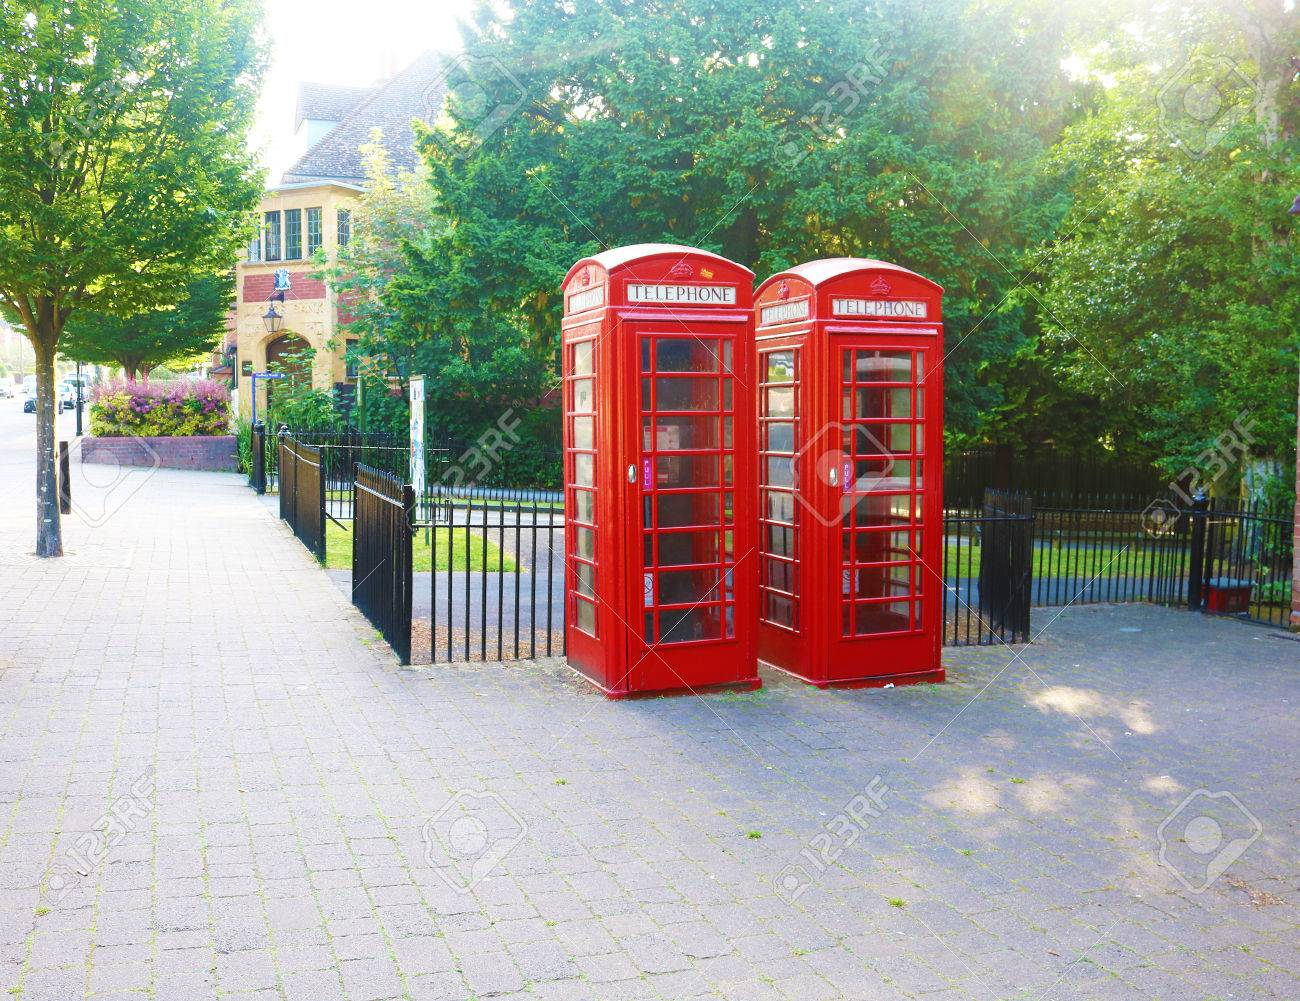 British telephone box Birmingham england Stock Photo - 80694081